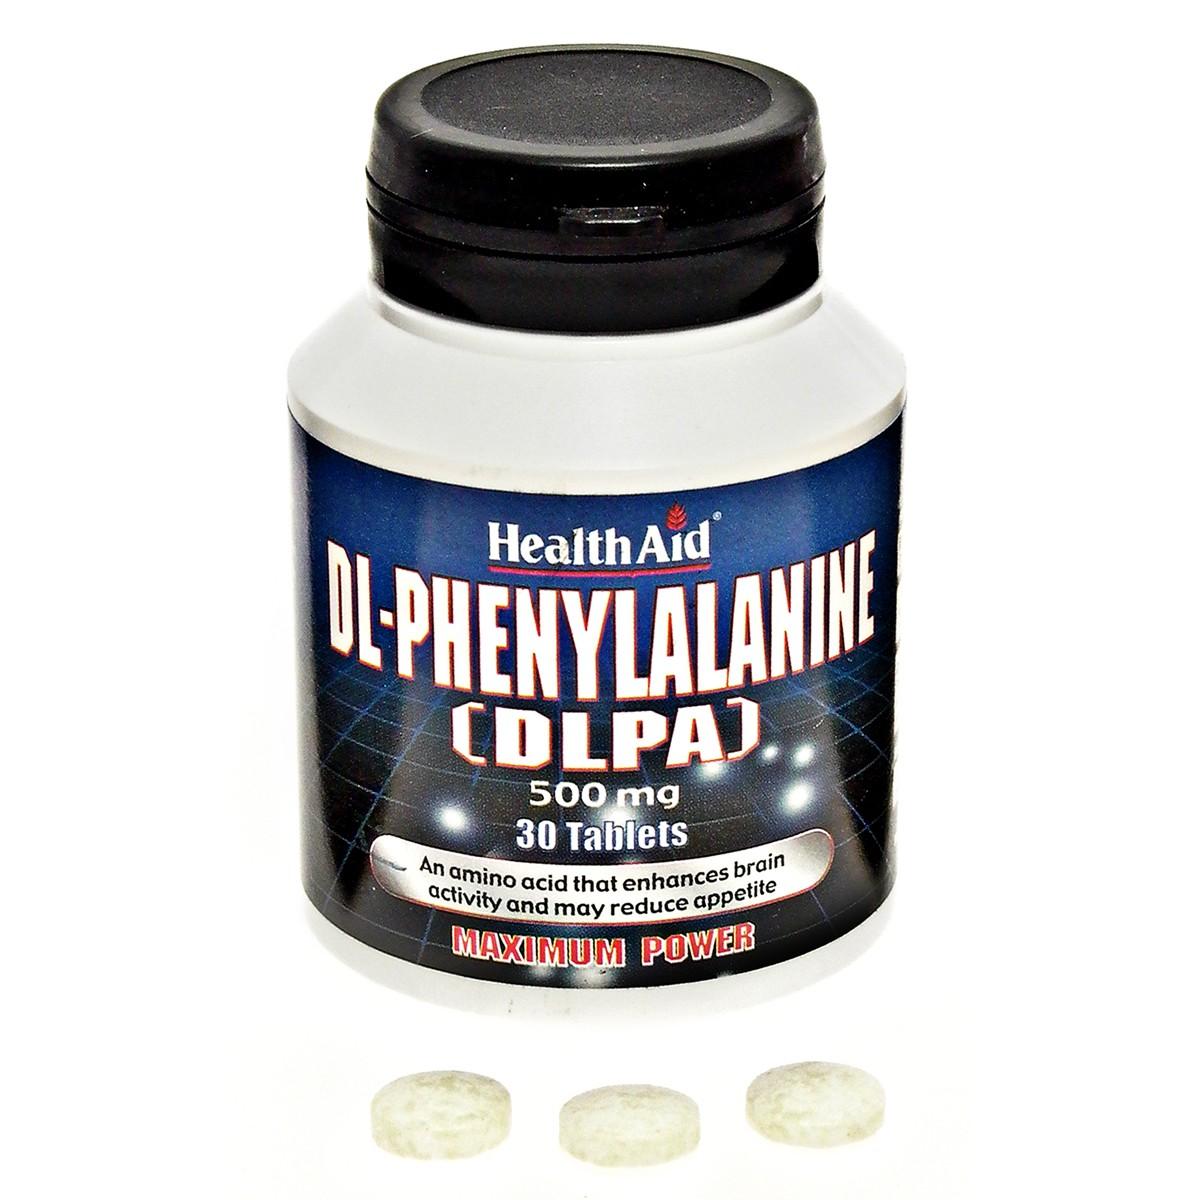 HealthAid DL-Phenylalanine (DLPA) 500mg